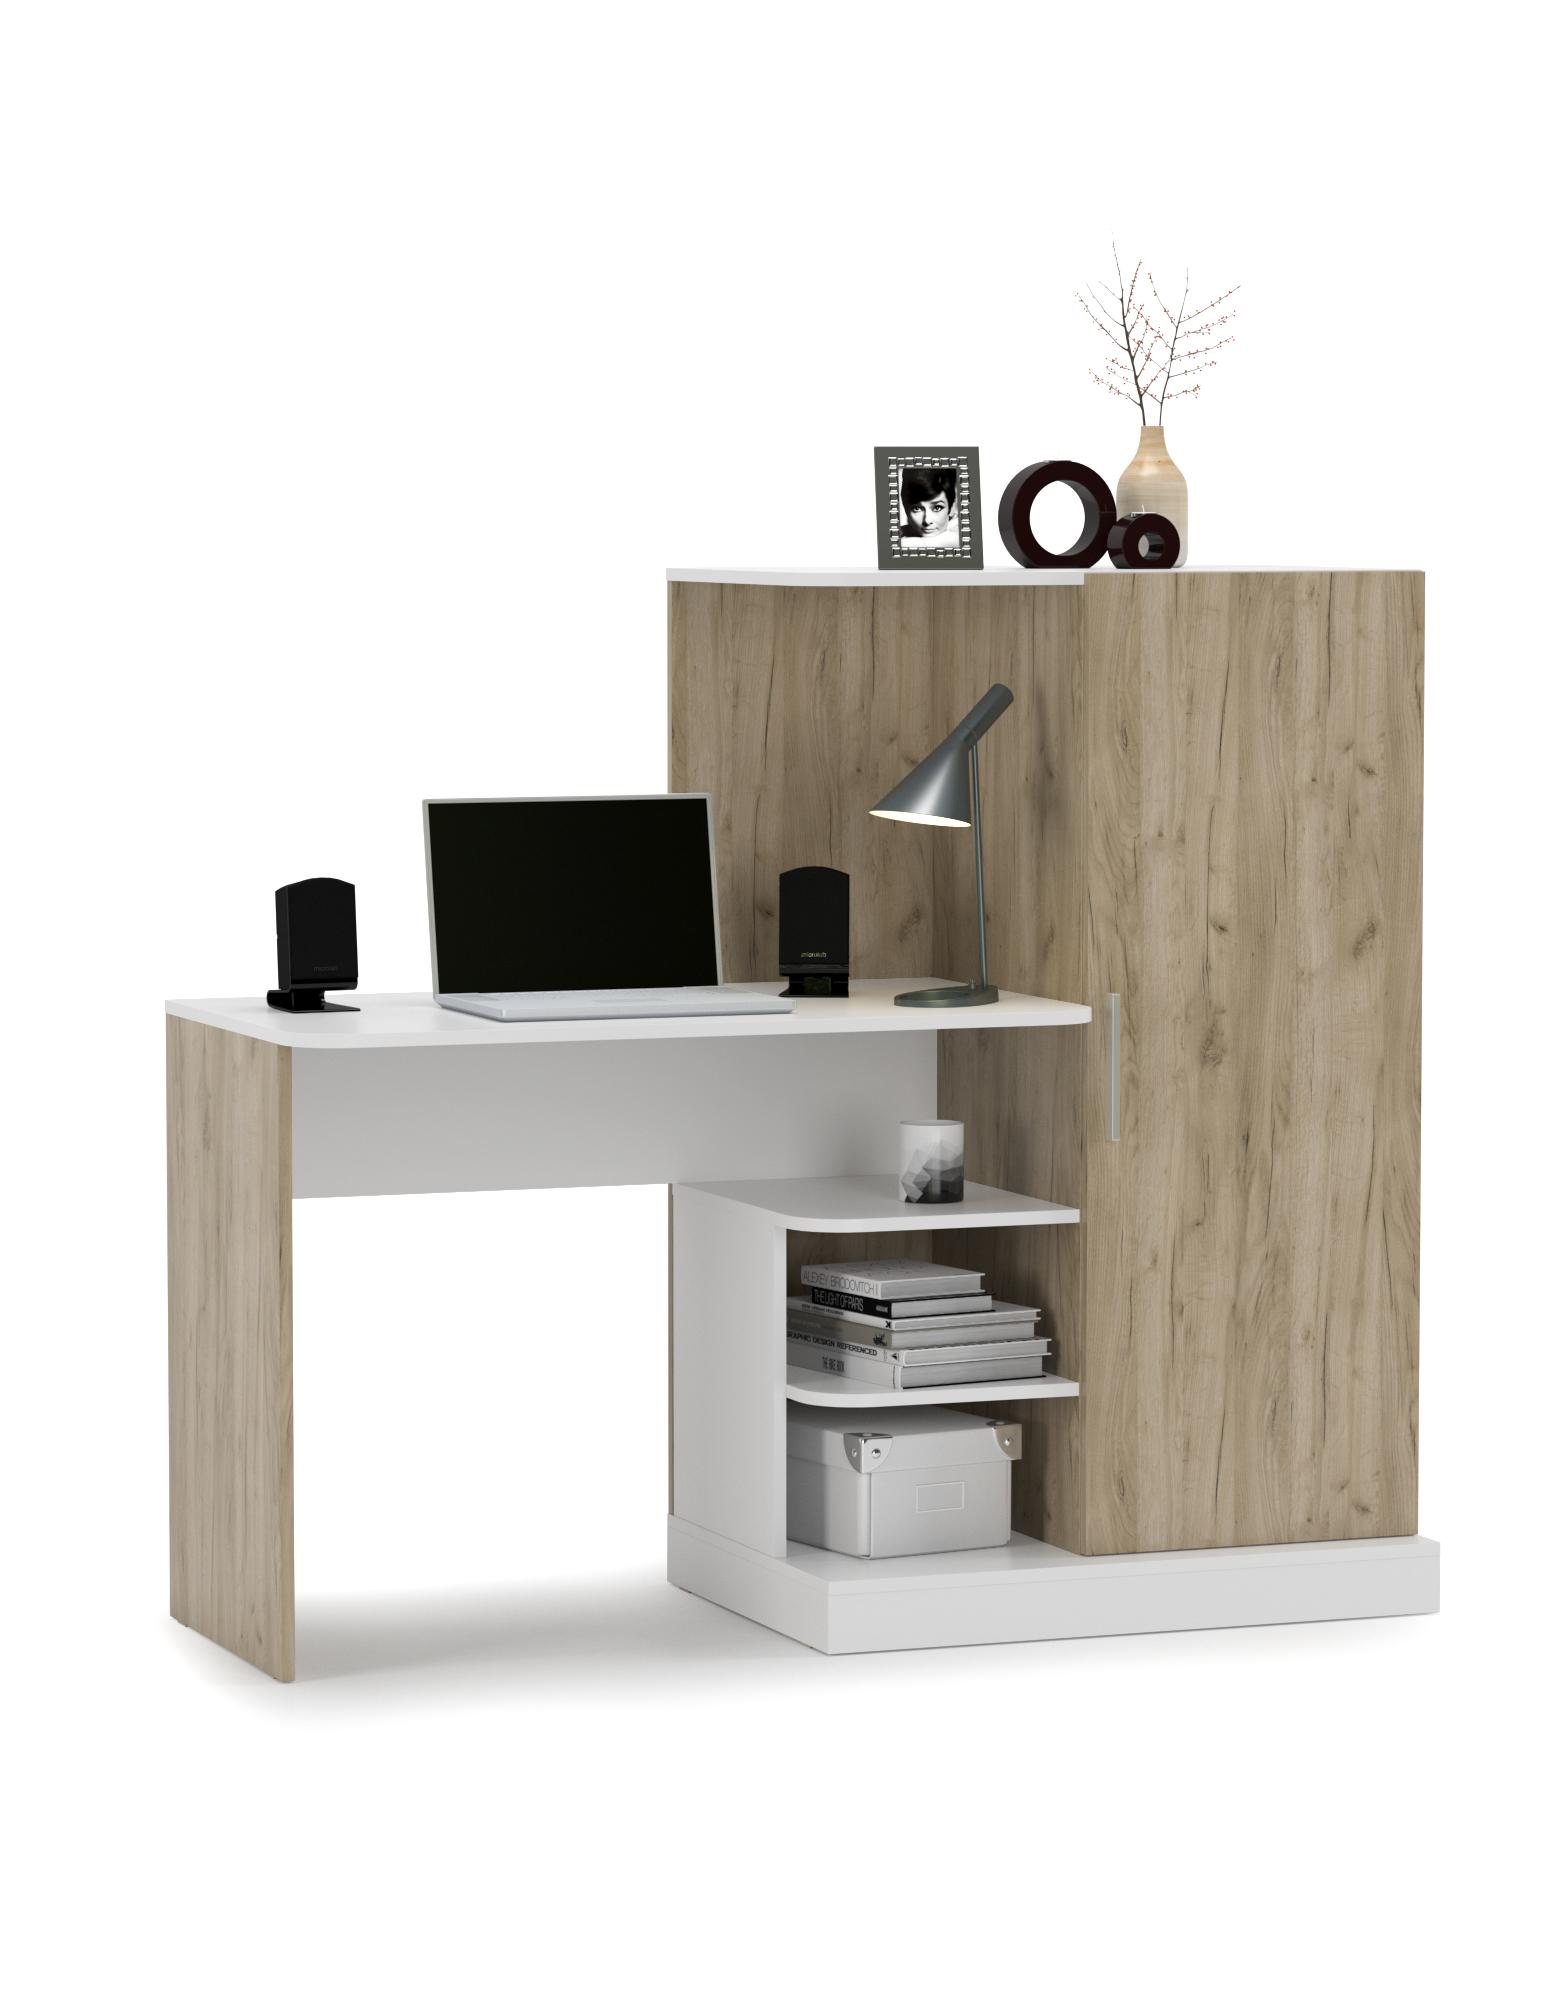 Стол компьютерный Mobi Лайт 03.247 дуб крафт серый/белый премиум, 145х56,7х126,6 см